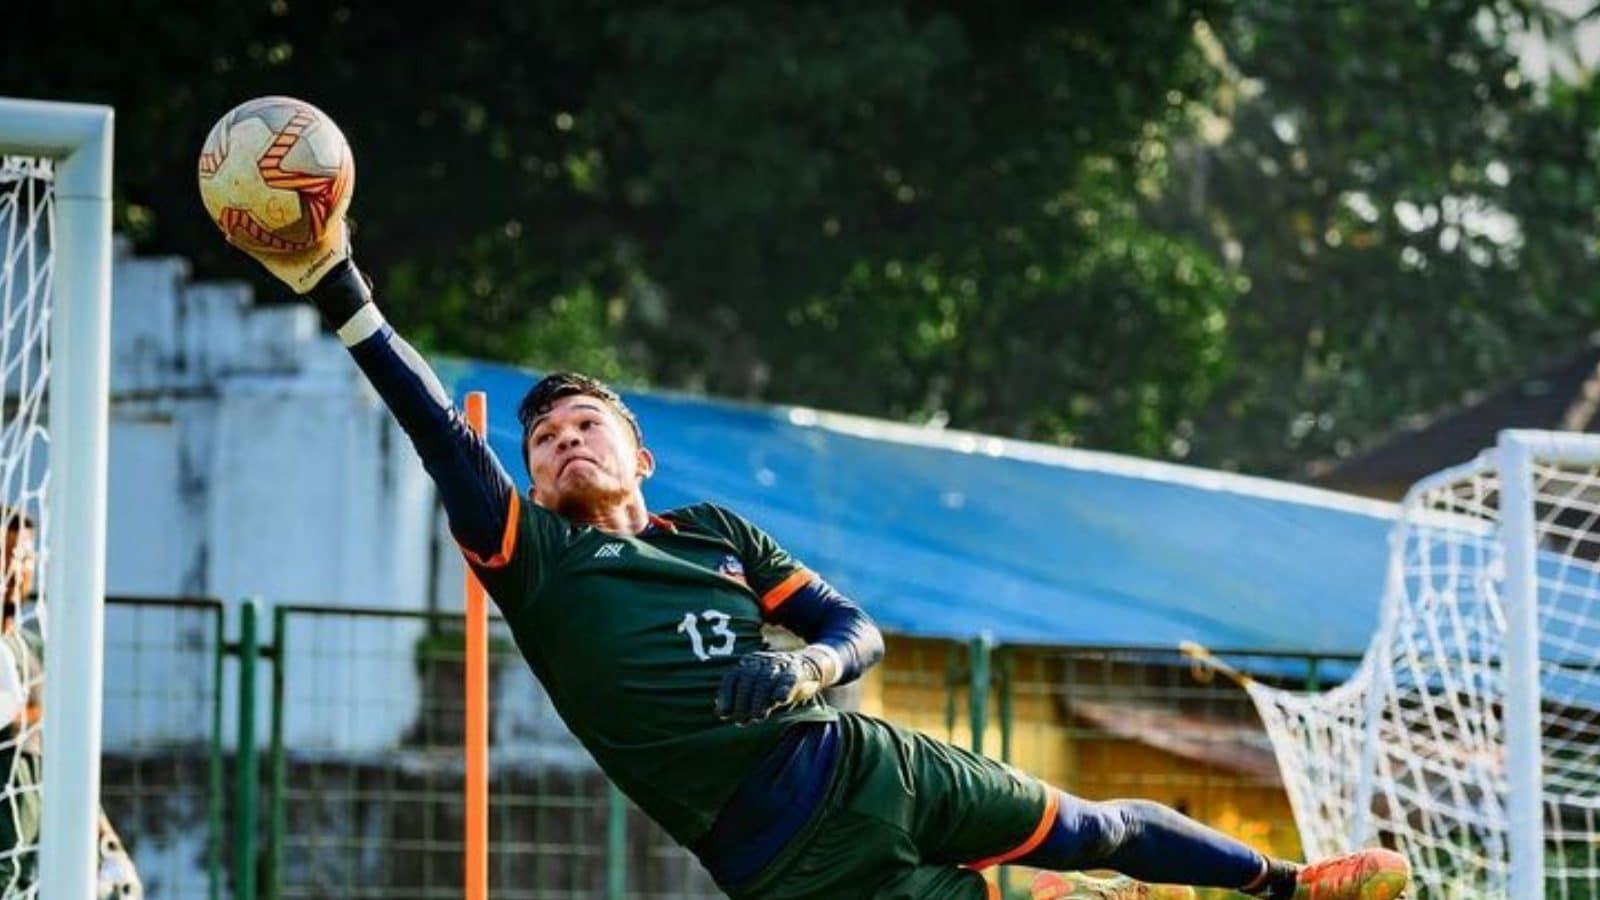 ISL Transfer News: Mumbai City FC Confirm Signing of Goalkeeper Mohammad Nawaz